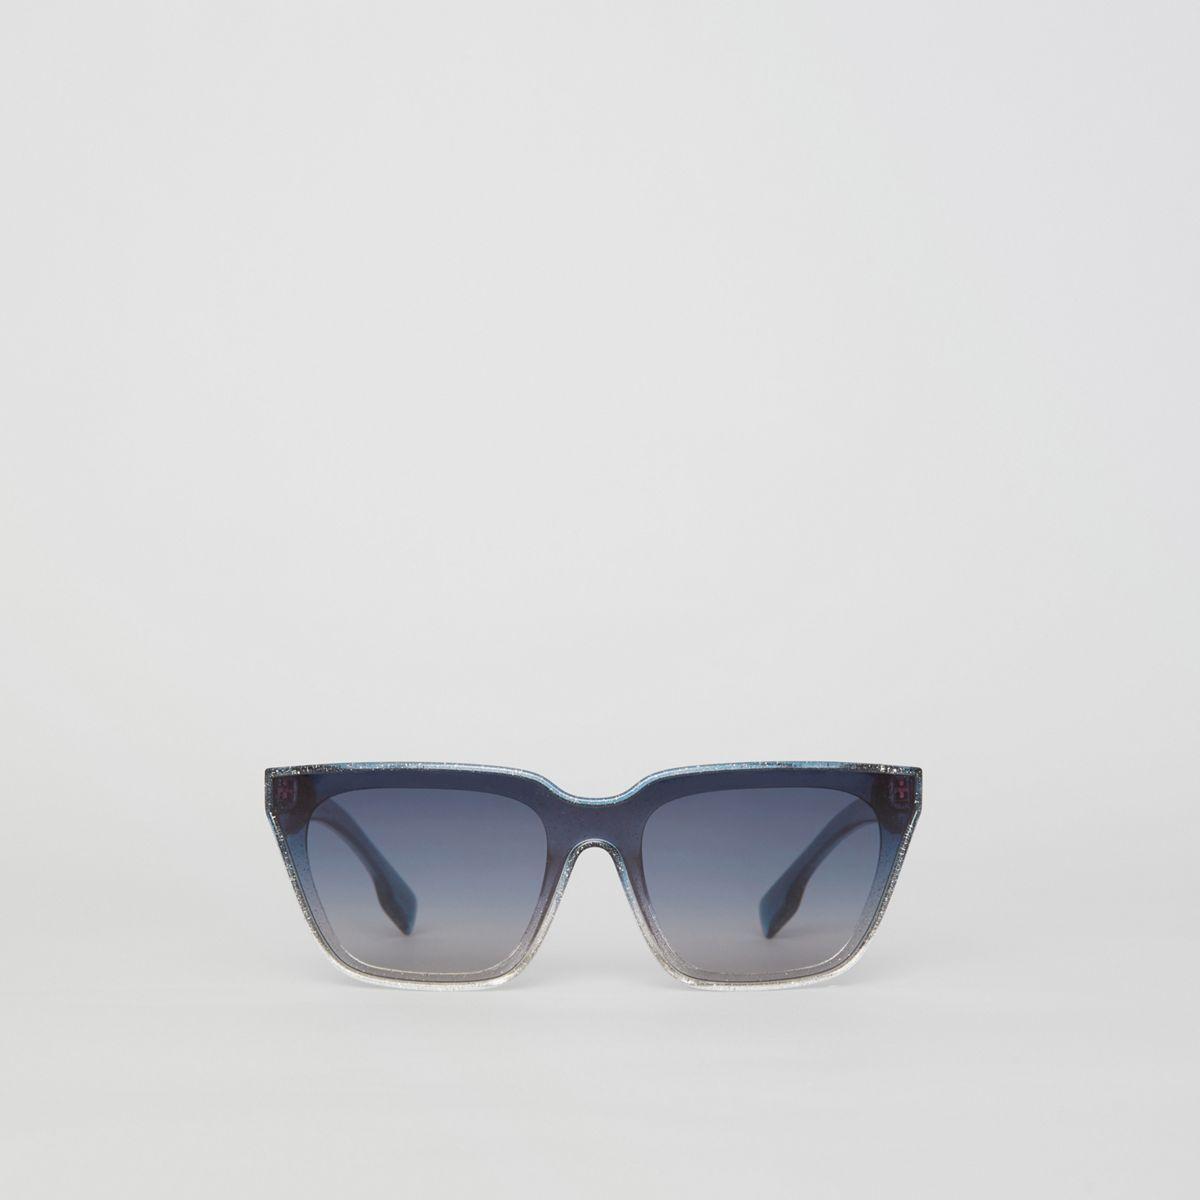 cecae0cf560196 Burberry - Blue Glitter Detail Square Frame Shield Sunglasses - Lyst. View  fullscreen